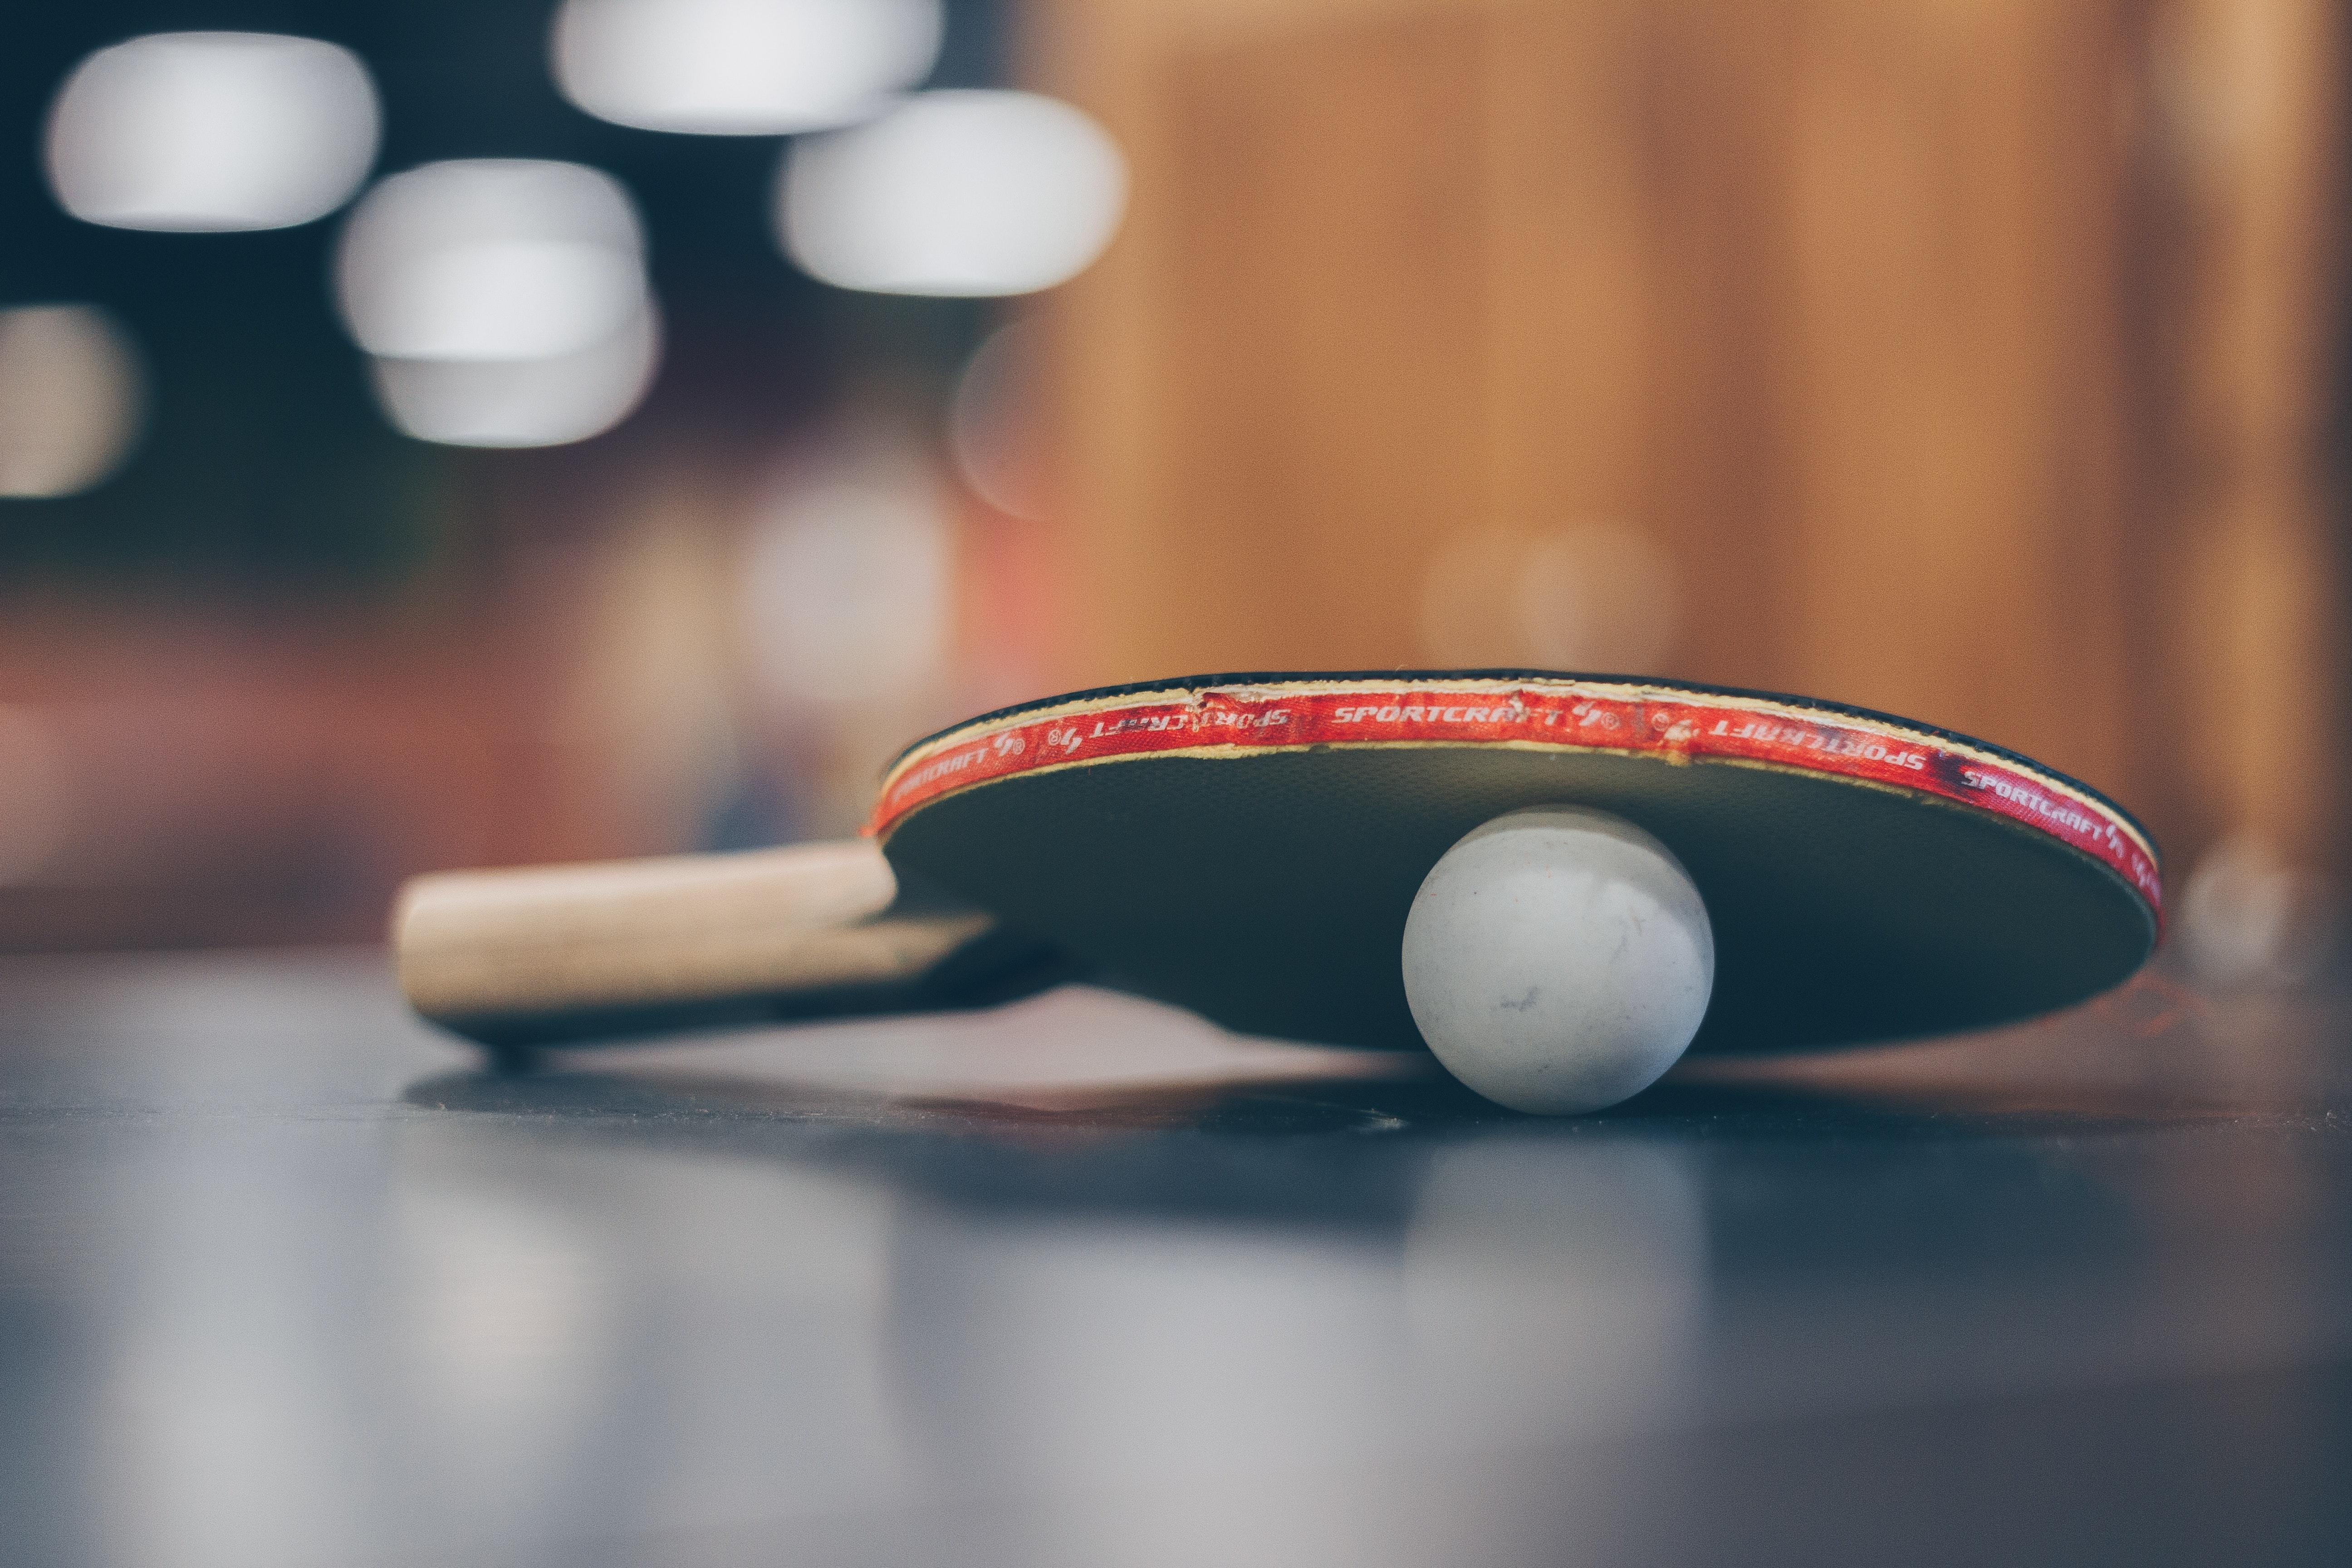 Bordtennisbat og udendørs bordtennisbord til sporten hos HomeX.dk